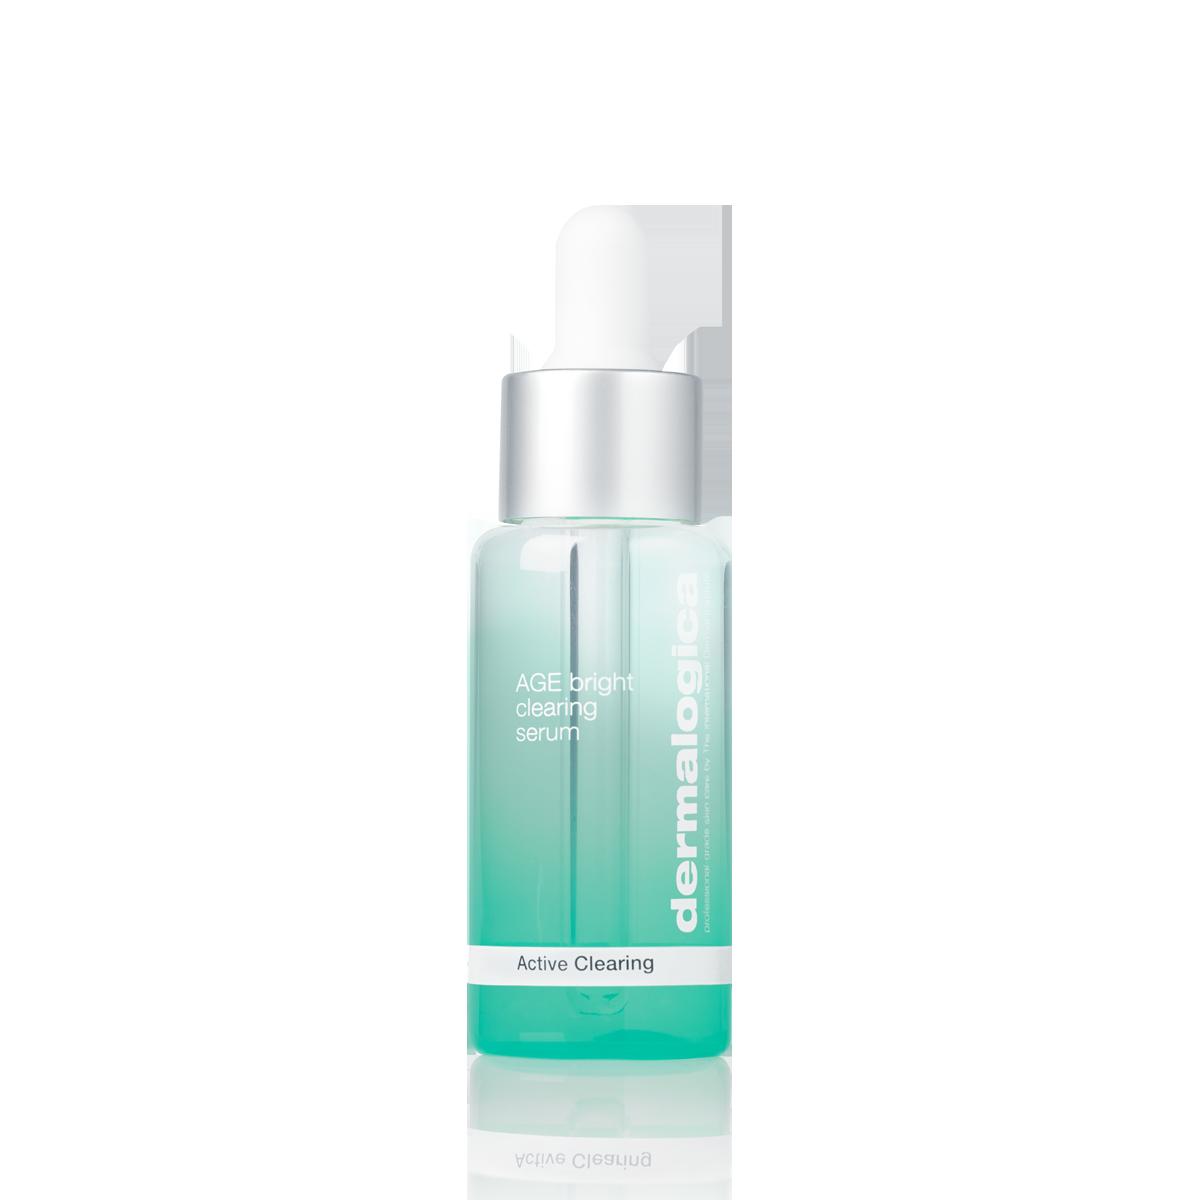 AGE Bright Clearing Serum - 30ml-1